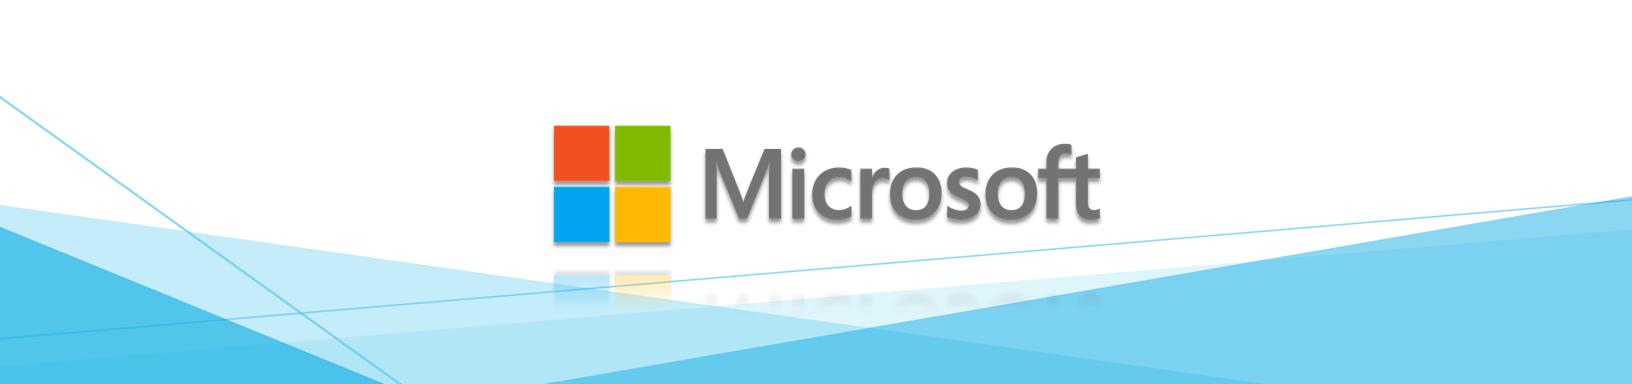 tienda online Microsoft